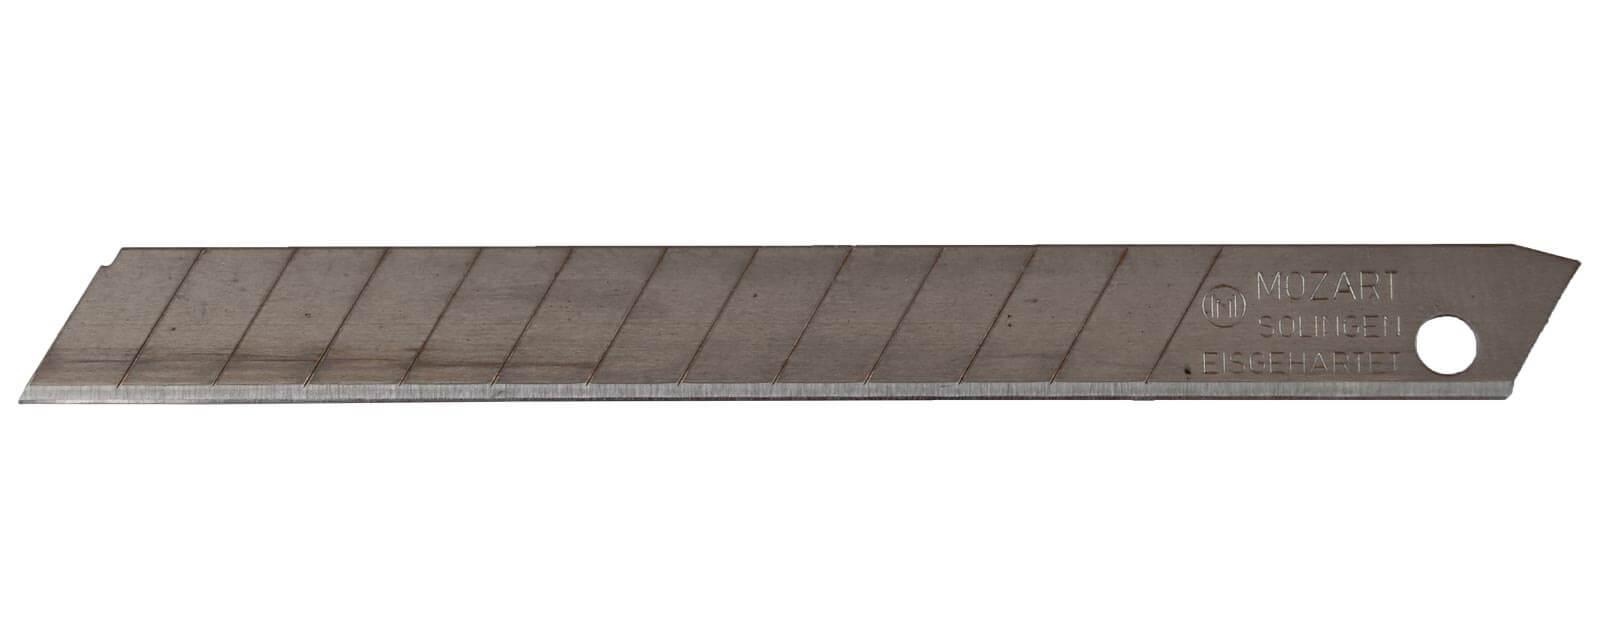 K061M-Cuttermesser-Klinge-9mm-Abbrechklinge-Komfort-Mozart-Solingen-CURT-tools